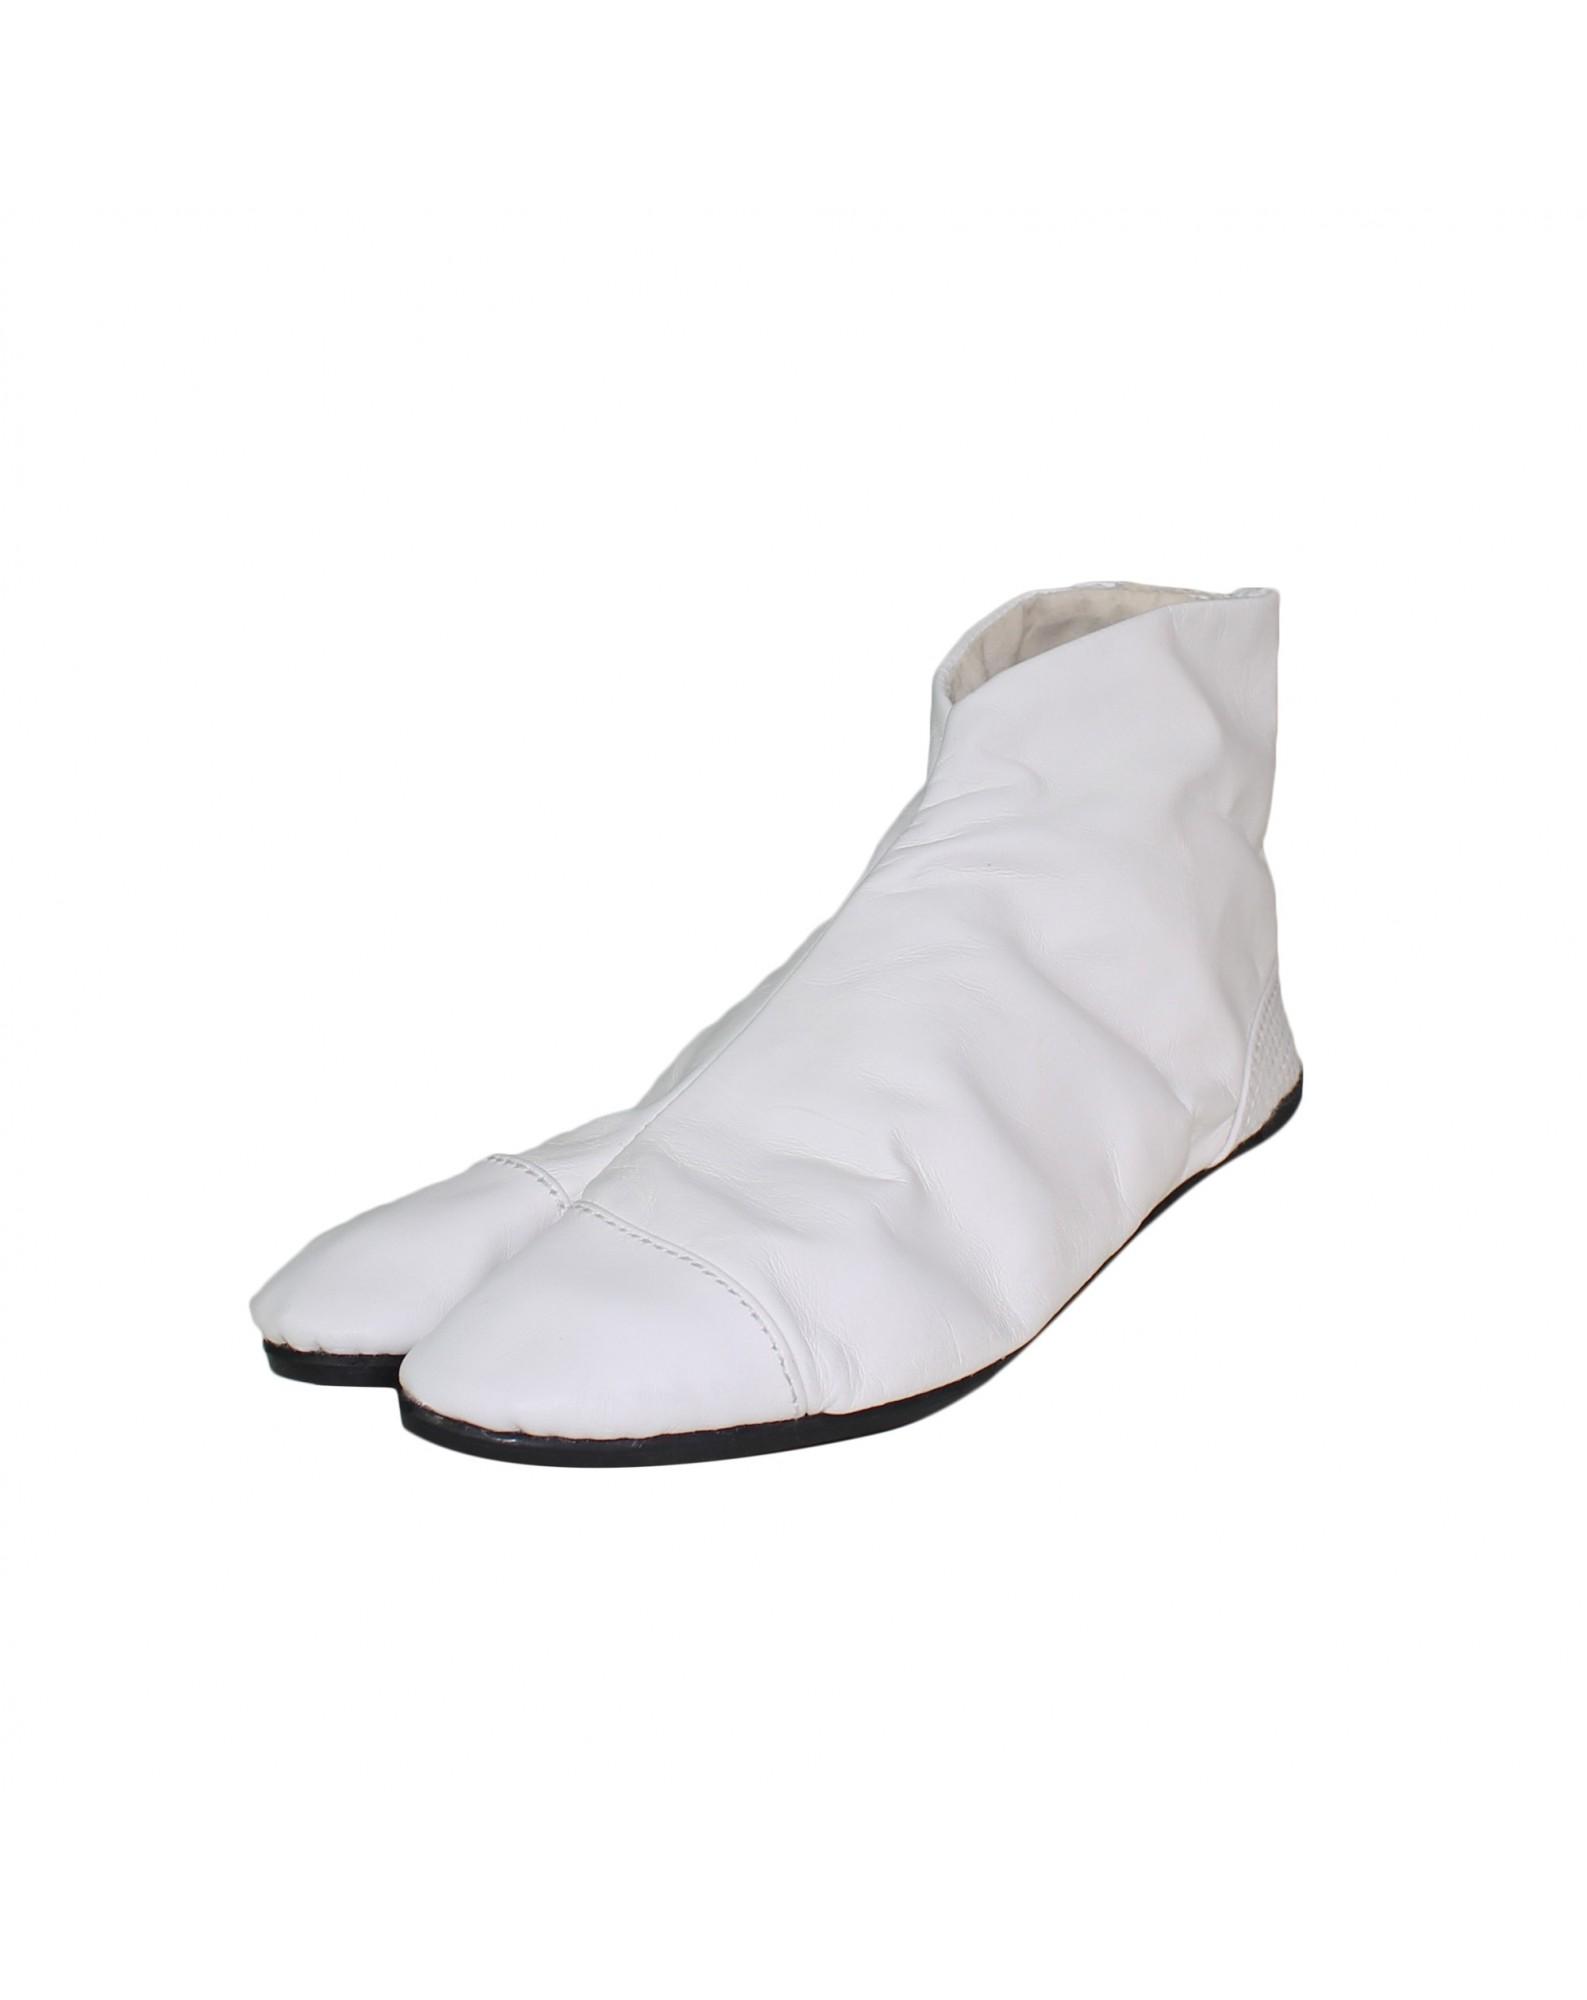 Uba-white